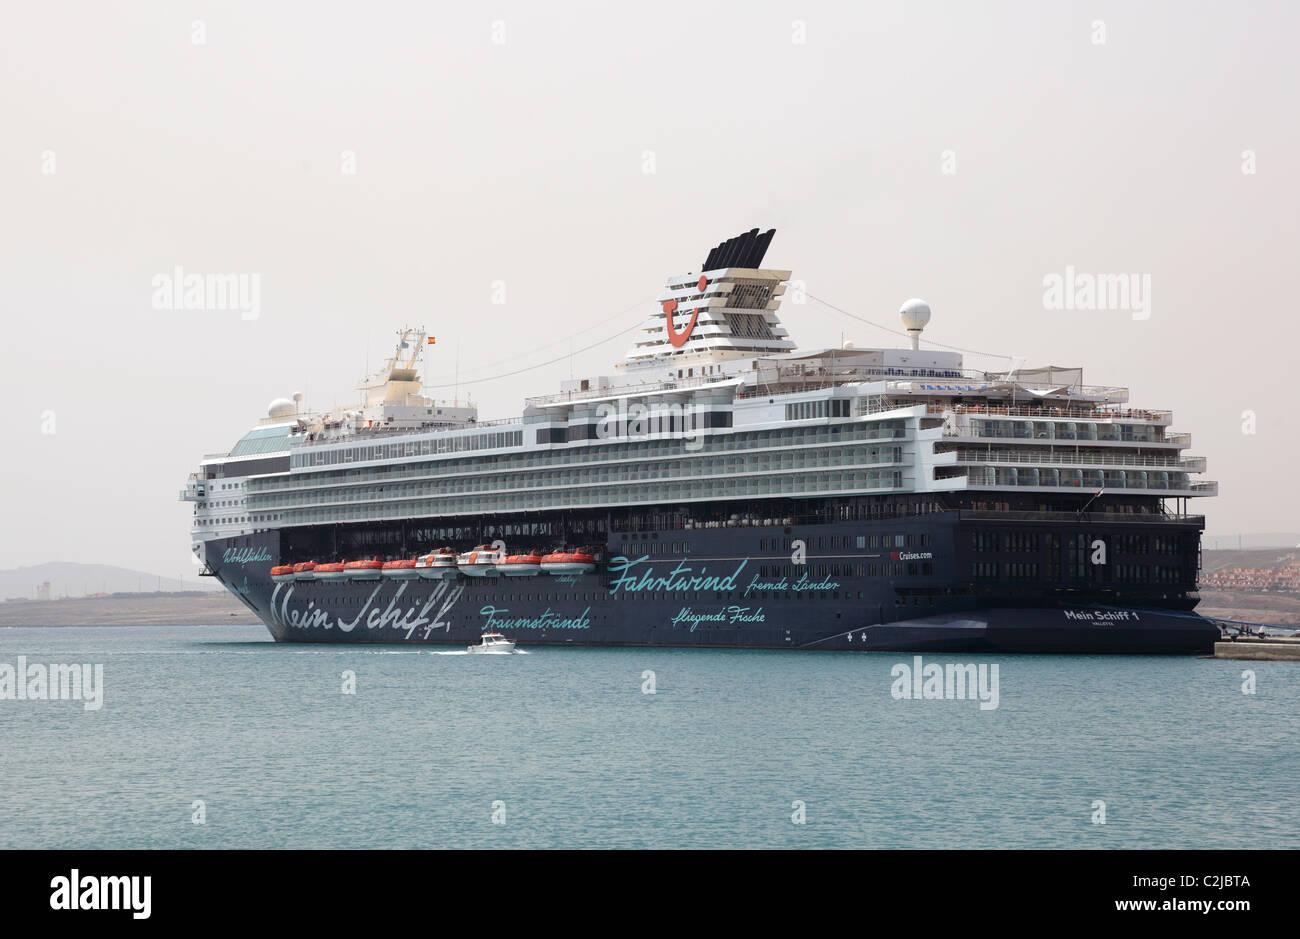 Cruise Ship Mein Schiff in the harbour of Puerto del Rosario, Canary Island Fuerteventura, Spain. - Stock Image